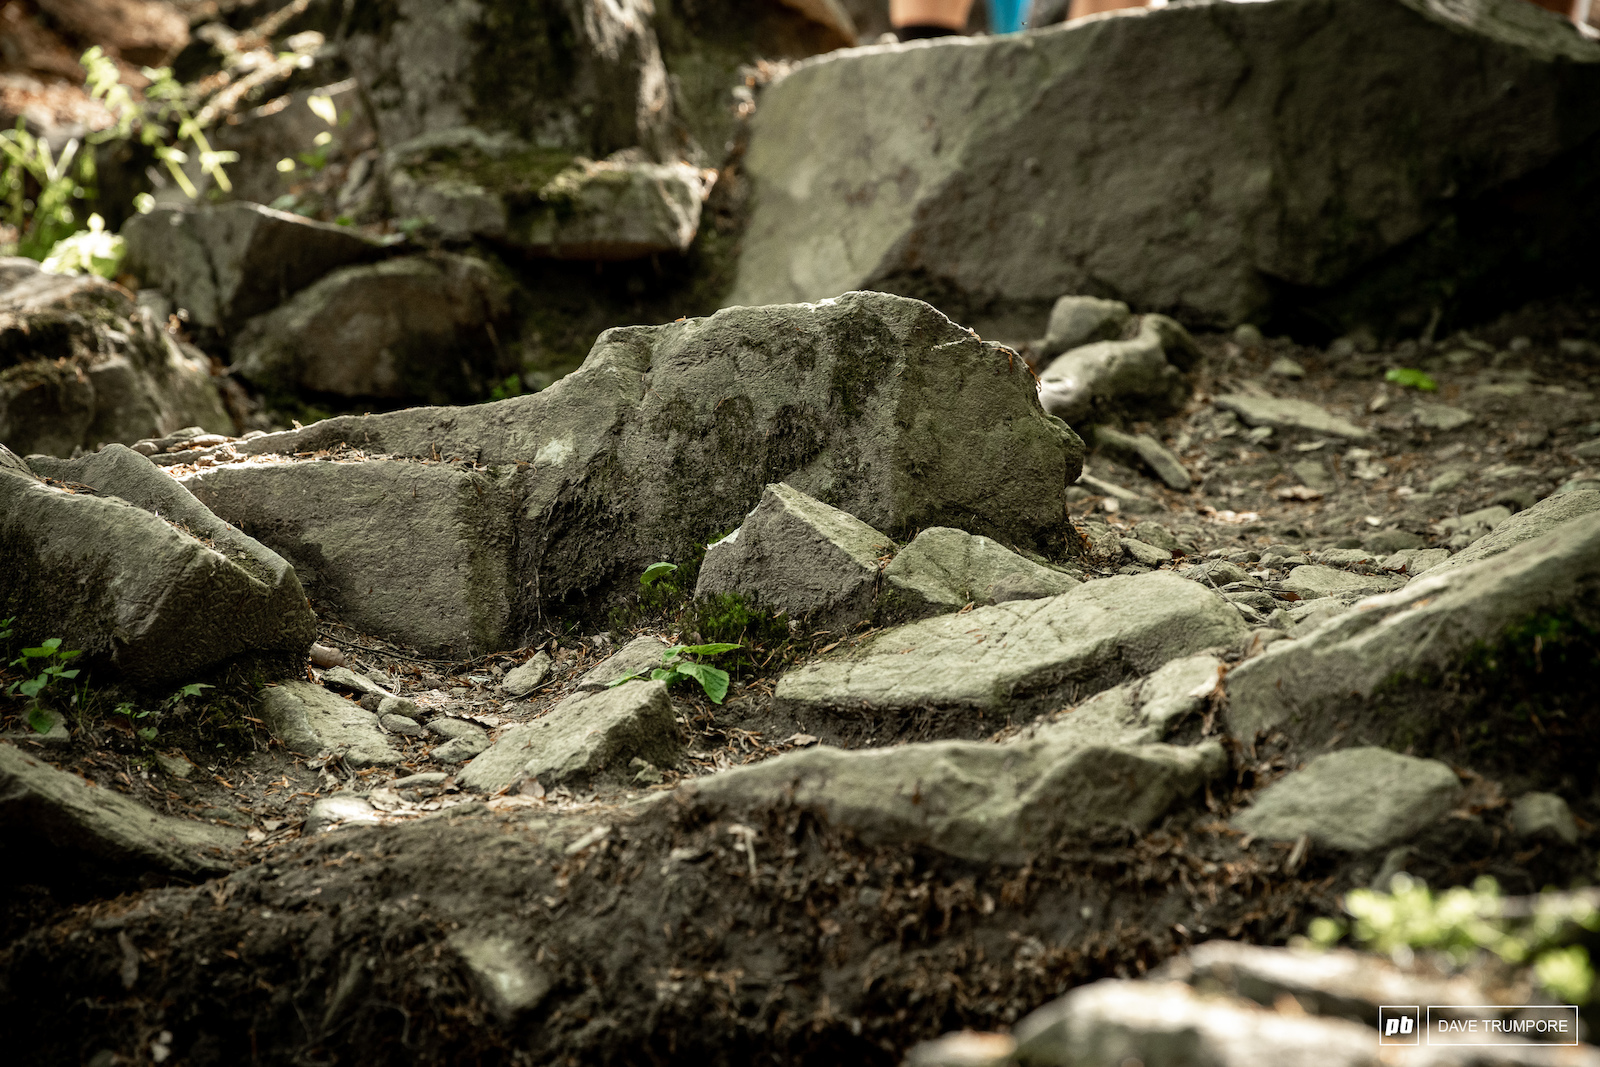 A close up of the infamous Maribor rock garden.